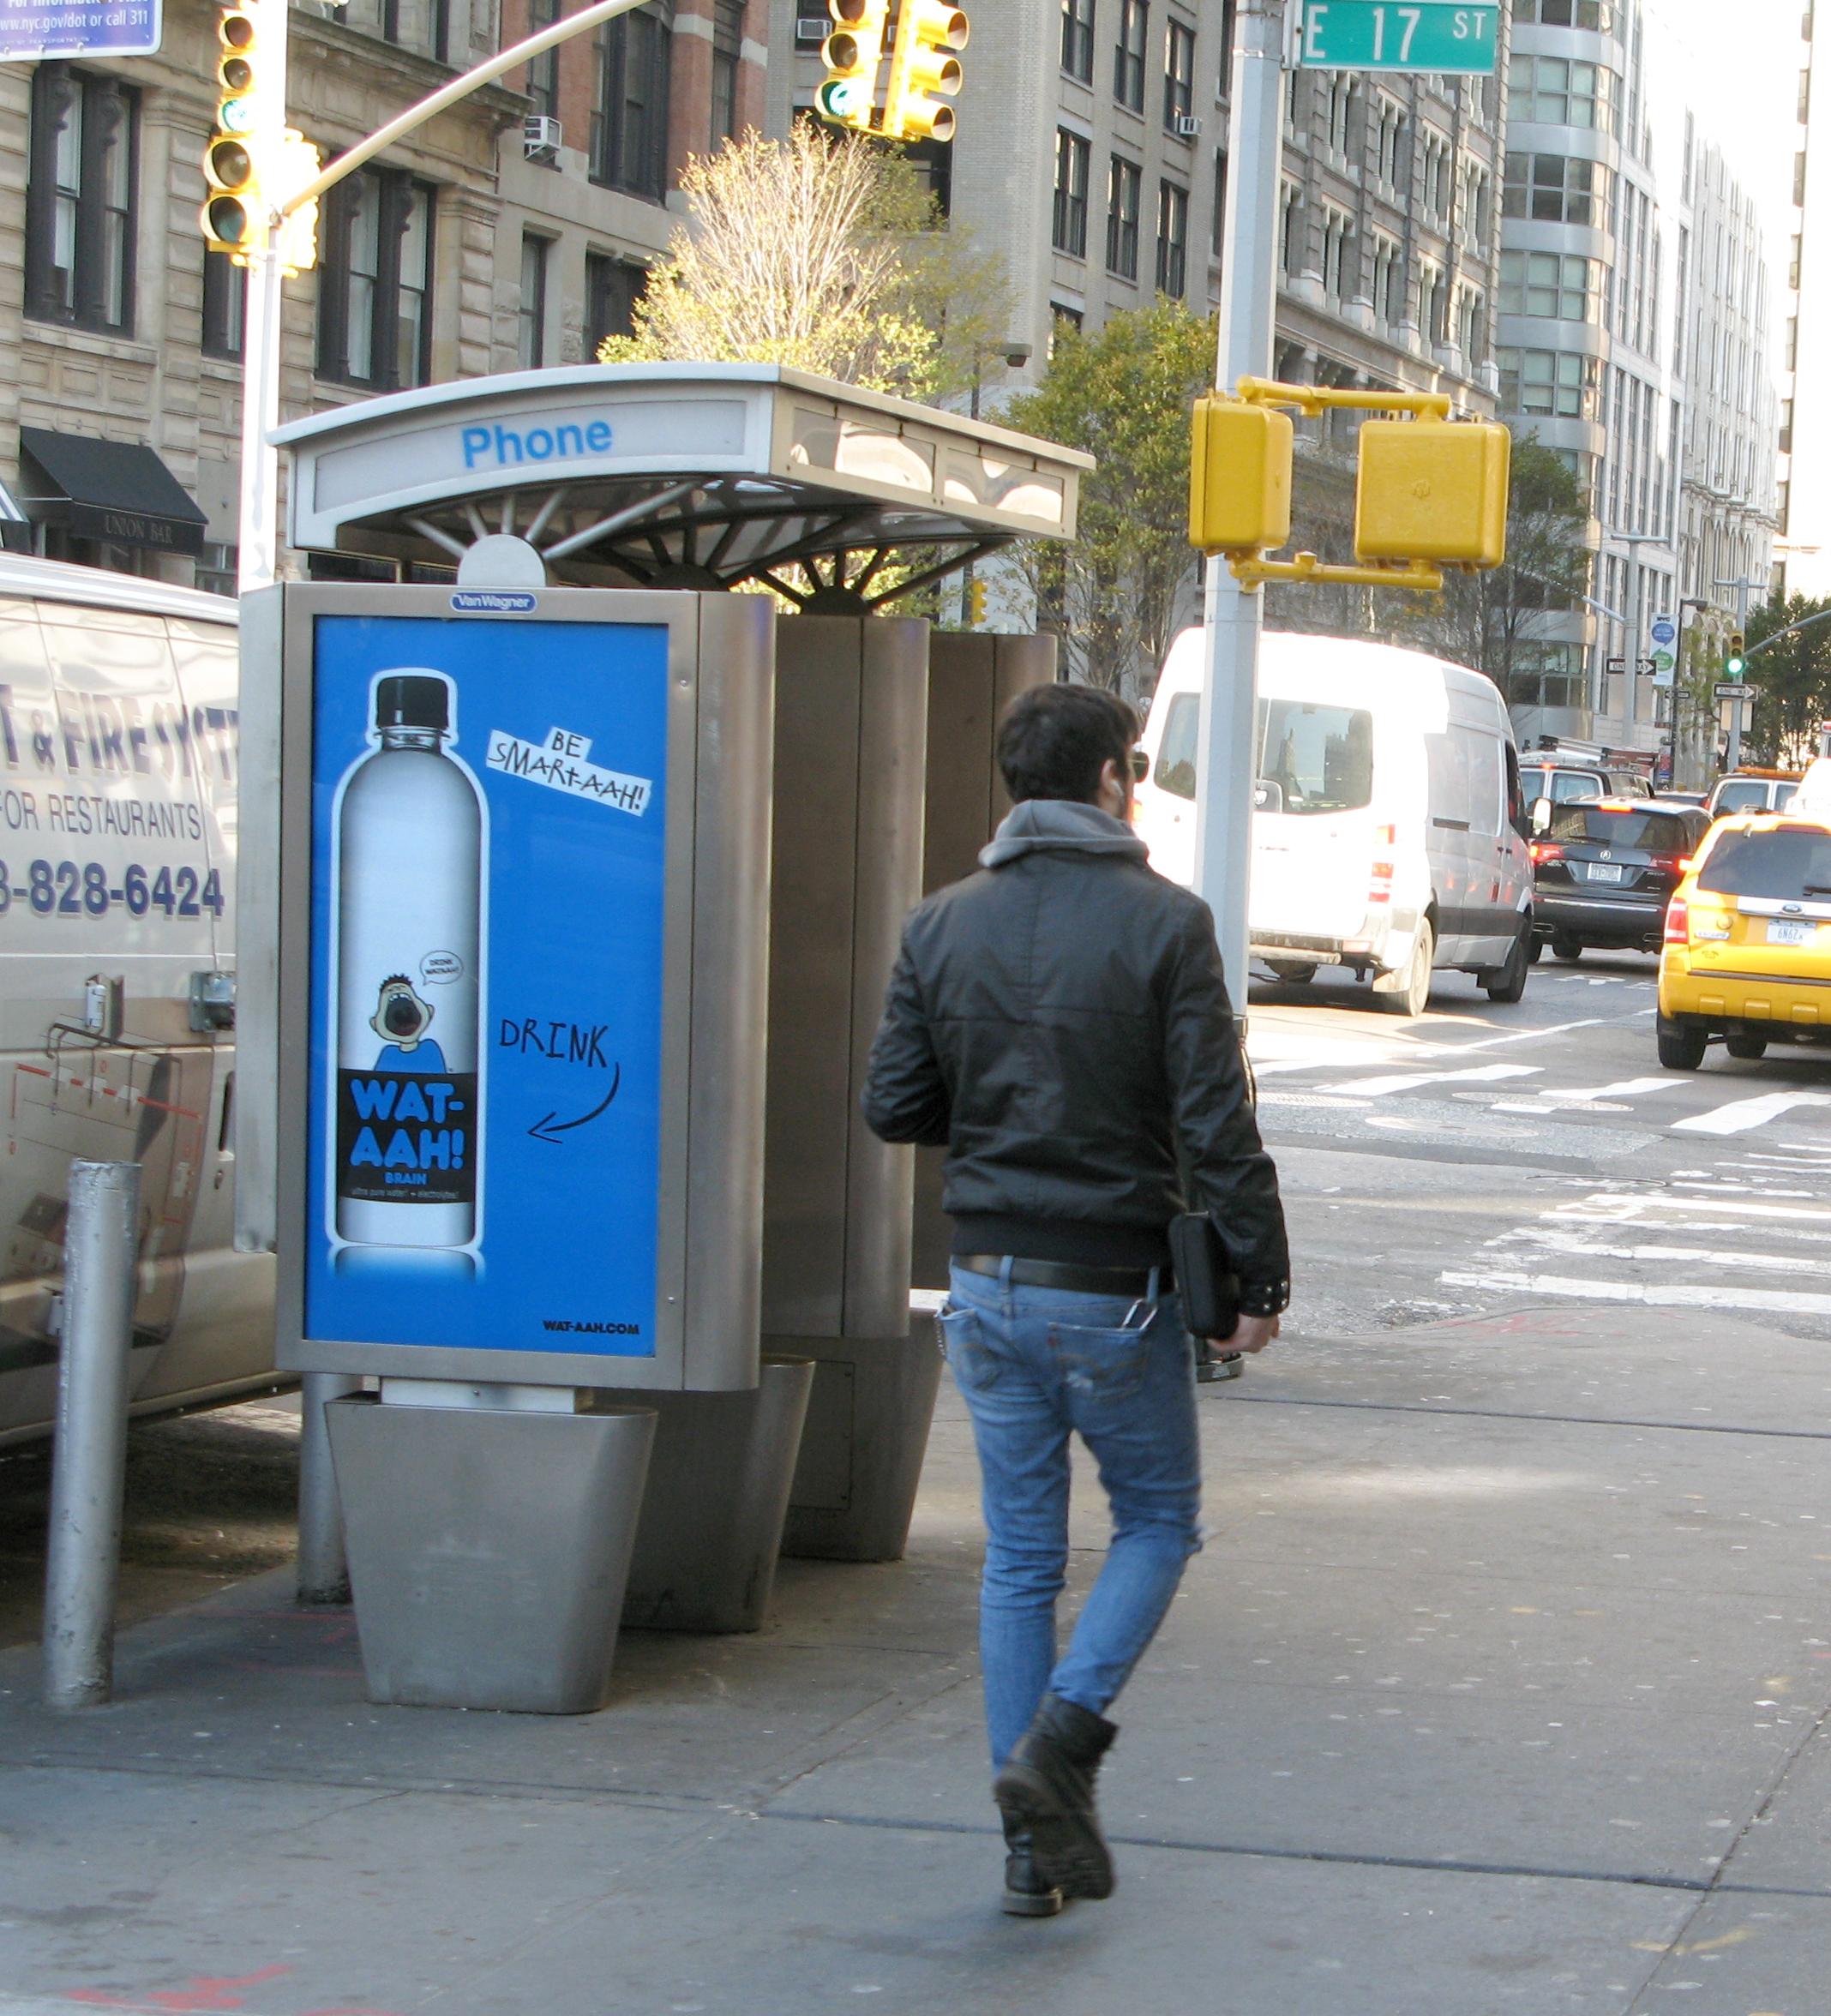 Wataah - NY - VW - Phone Kiosks - 11-06-11 (1).jpg